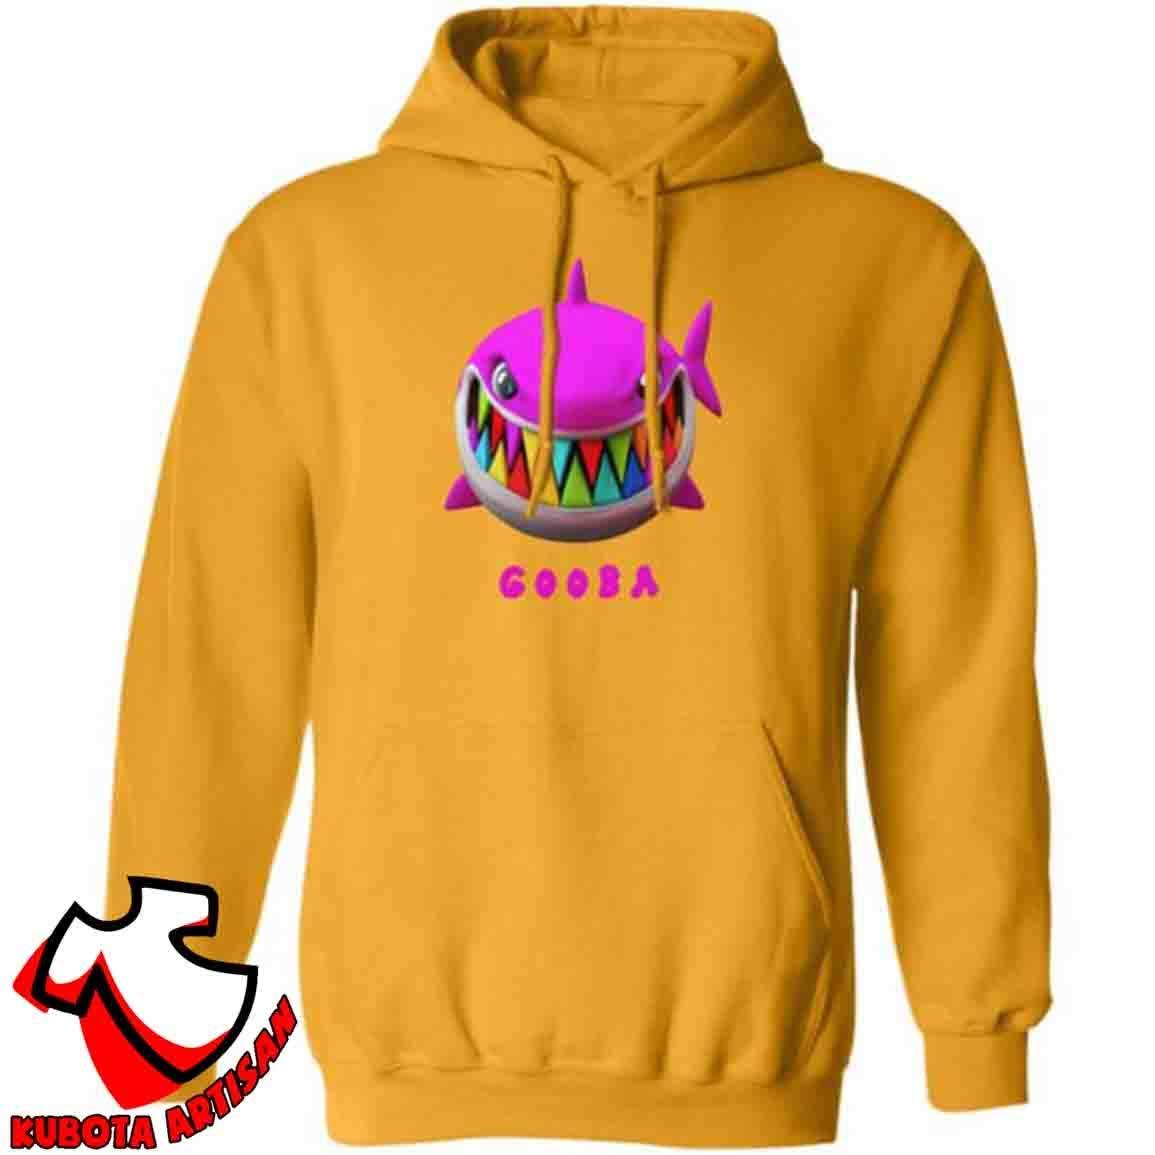 Amazon Com 6ix9ine Merch Gooba Shark T Shirt Long Sleeve Sweatshirt Hoodie Handmade